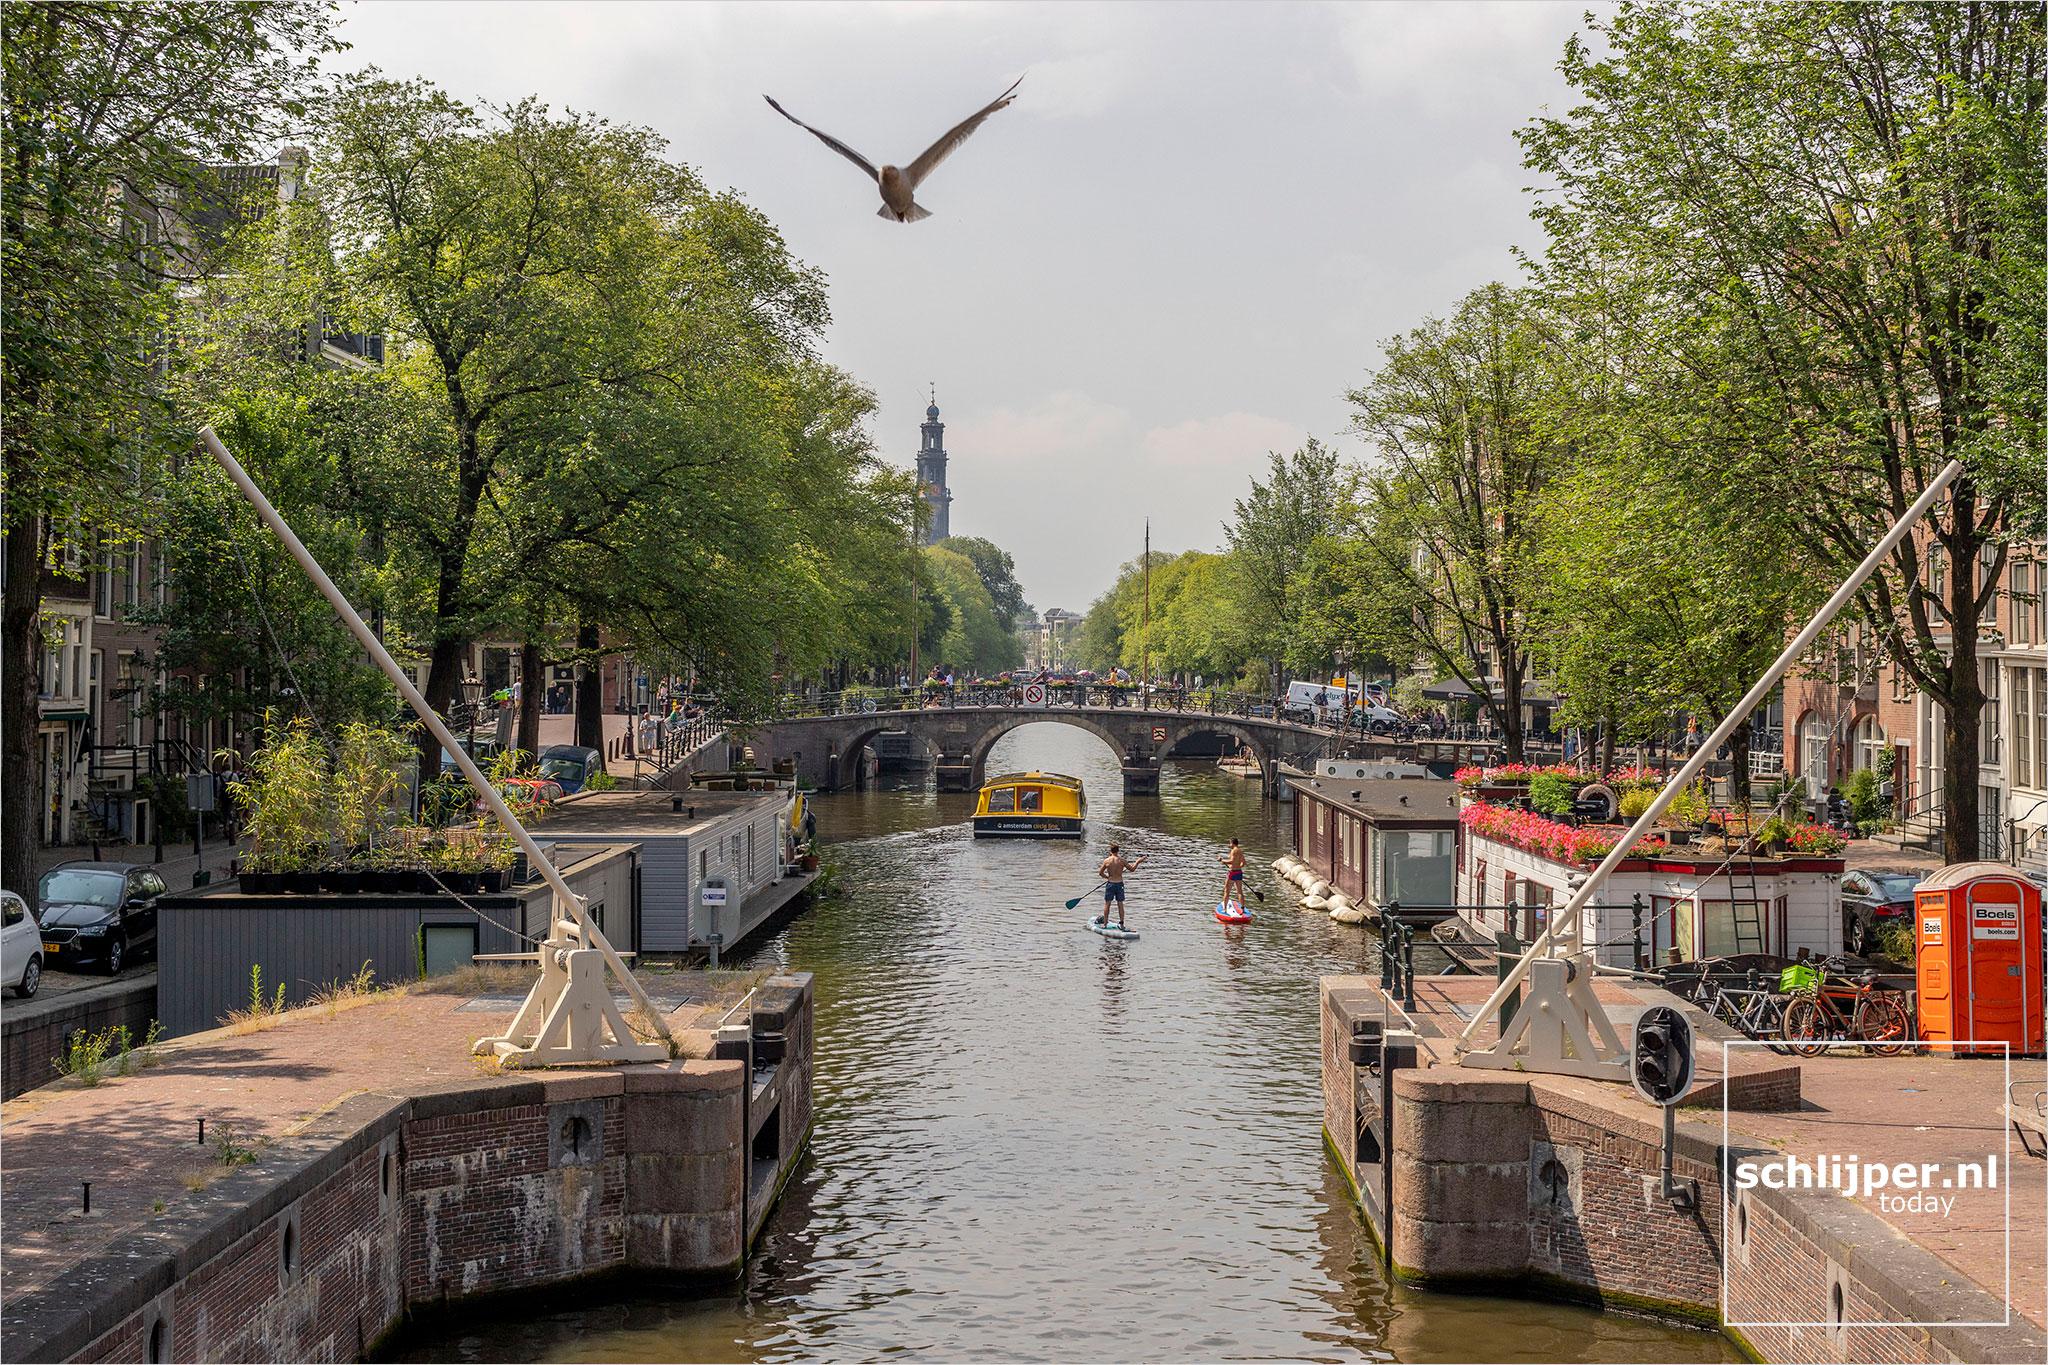 The Netherlands, Amsterdam, 25 juli 2021